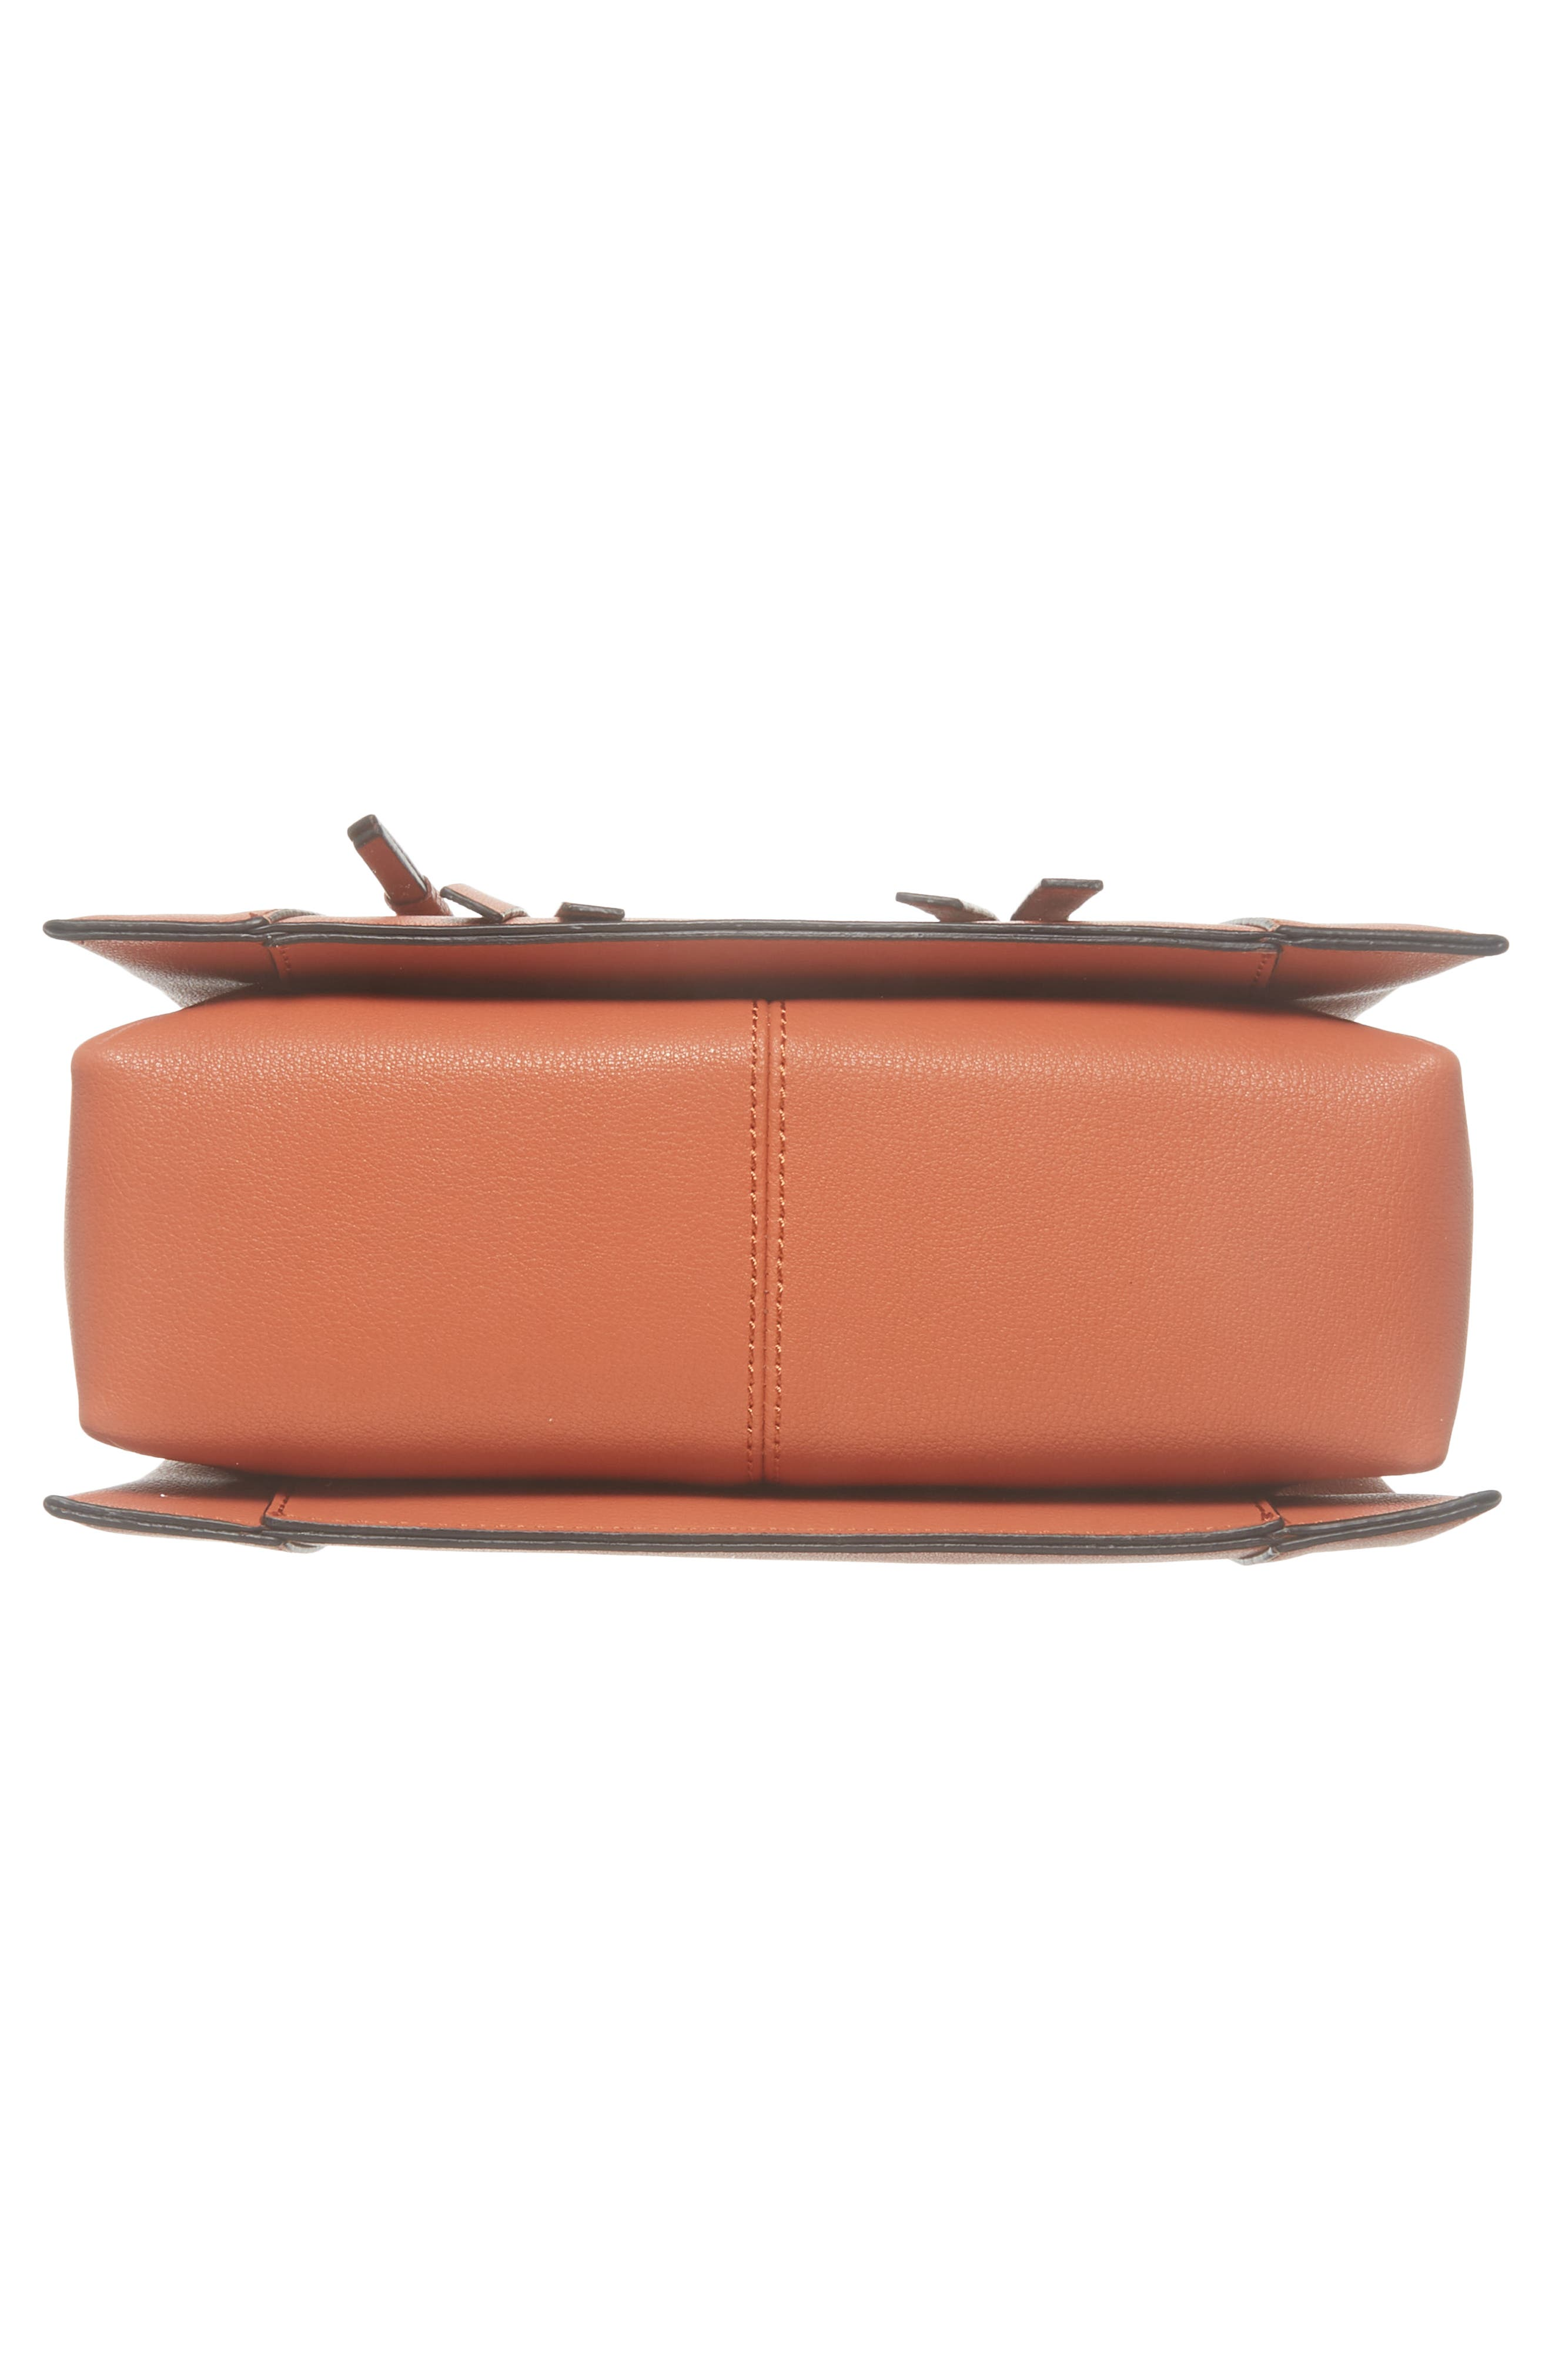 Everly Mini Shoulder Bag,                             Alternate thumbnail 6, color,